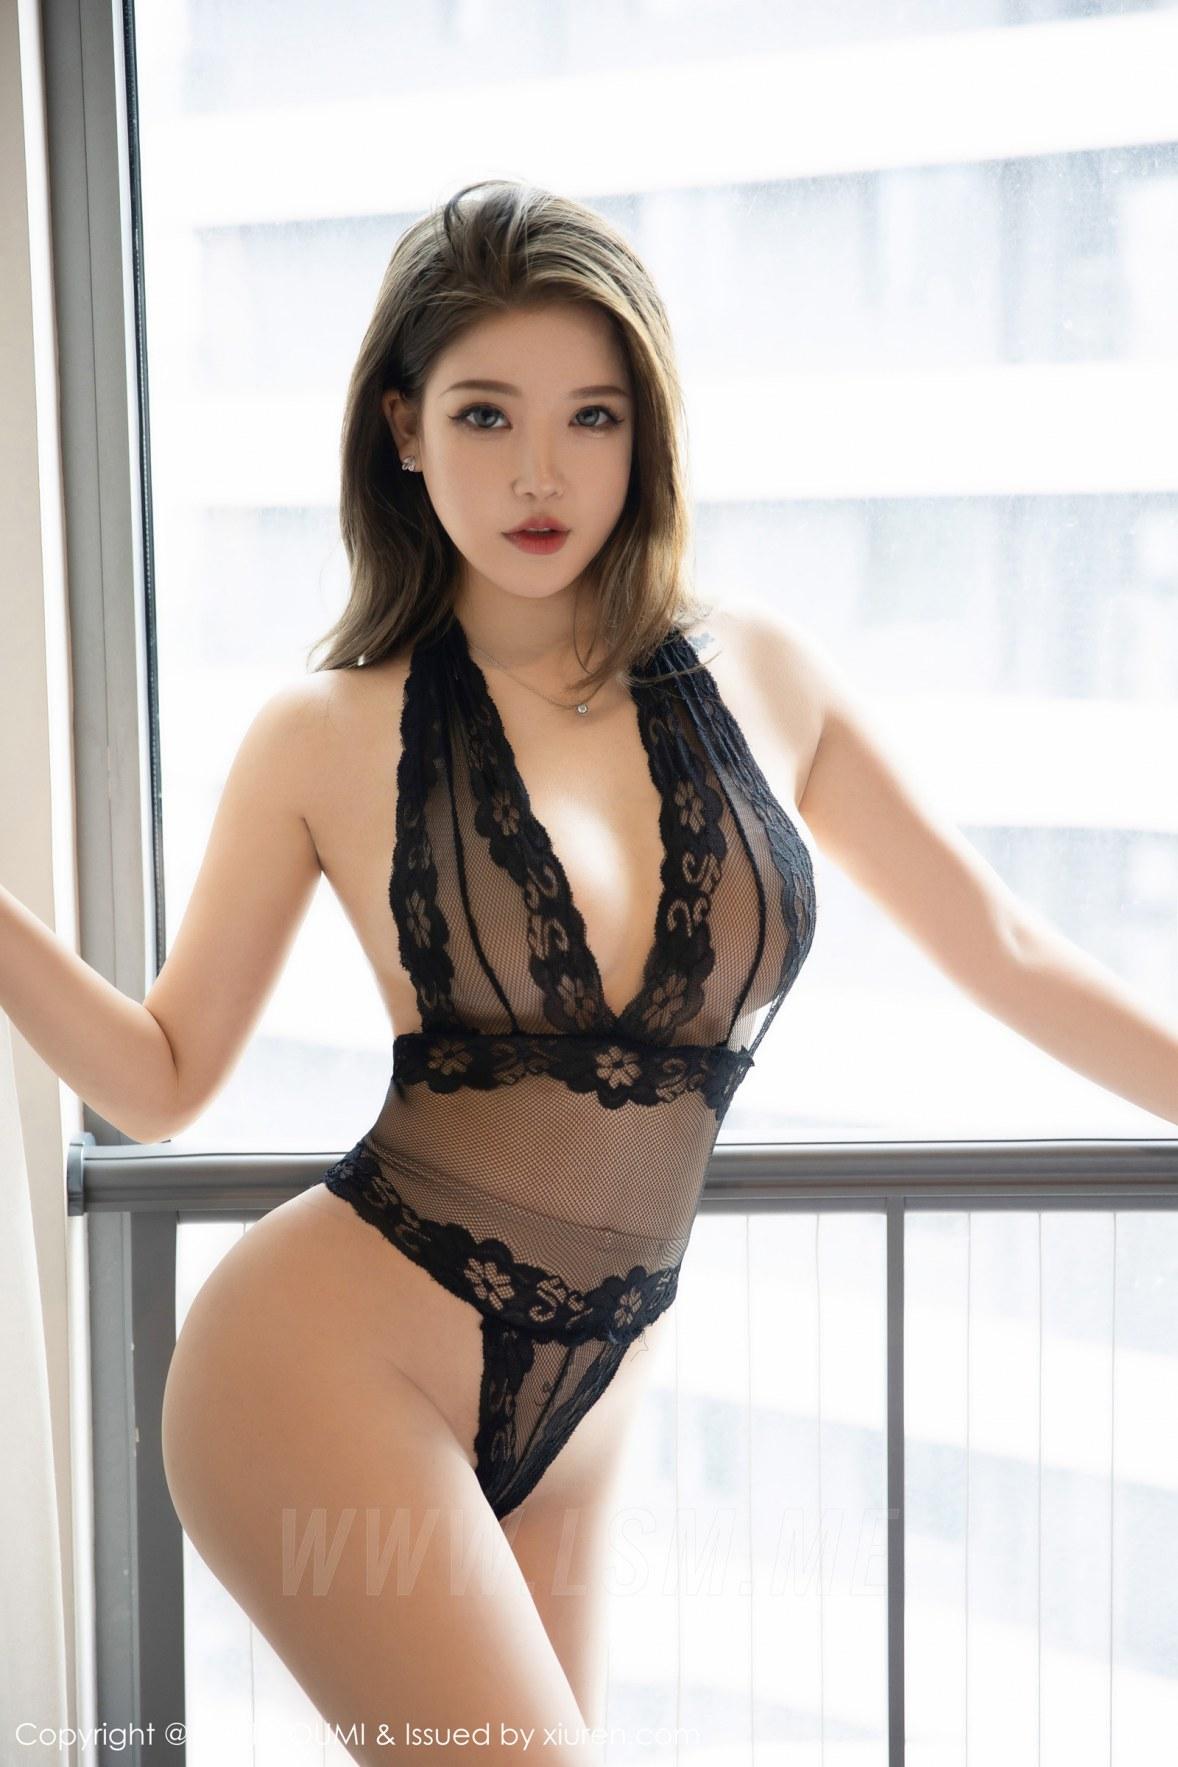 YOUMI 尤蜜荟 Vol.673 魅惑连体衣 小海臀Rena 性感写真333 - 1